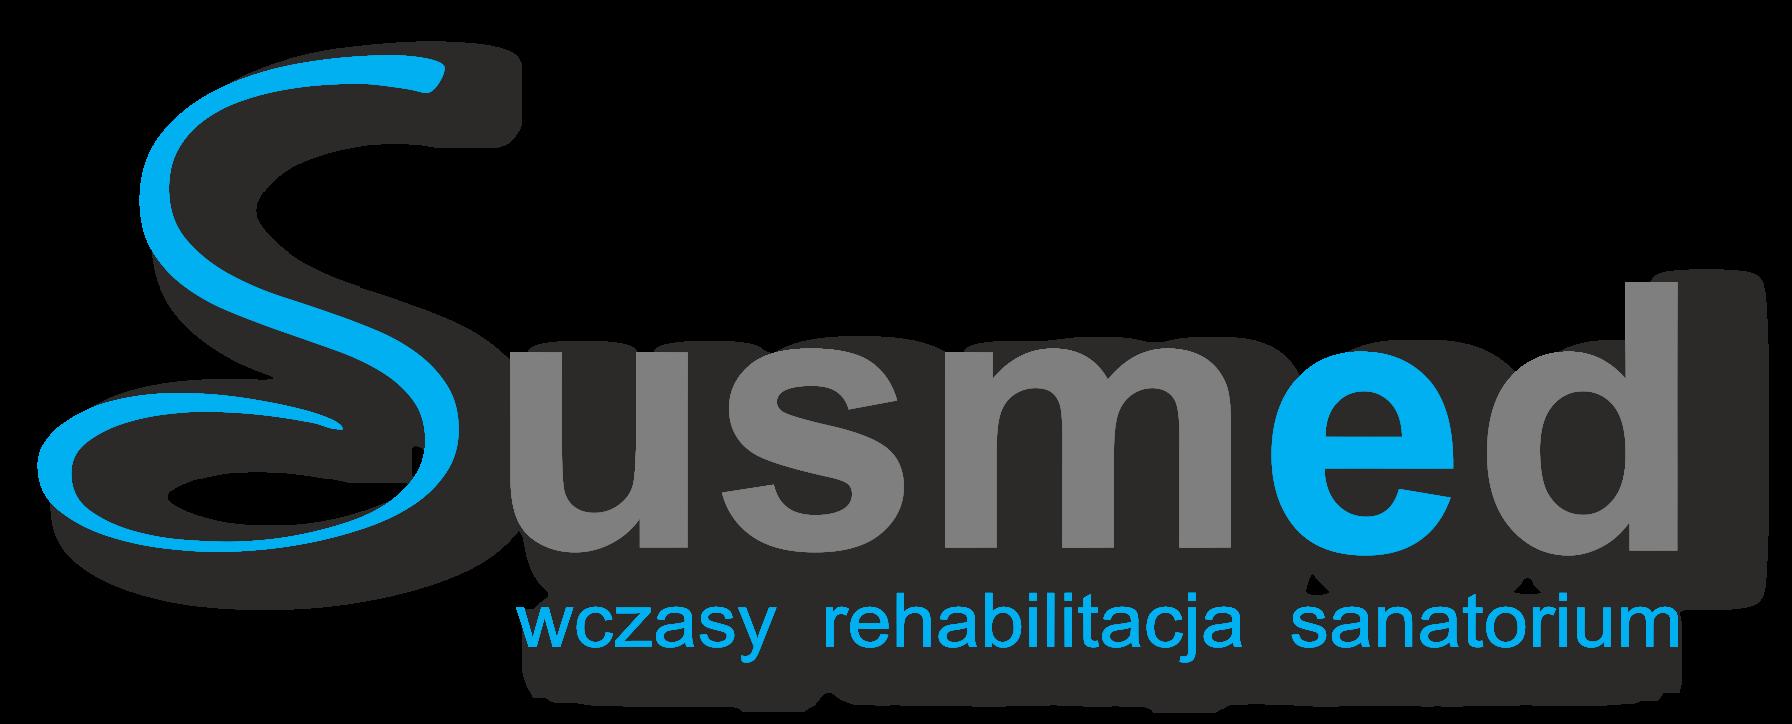 Logo Sanatorium Uzdrowiskowe Susmed - Dąbki